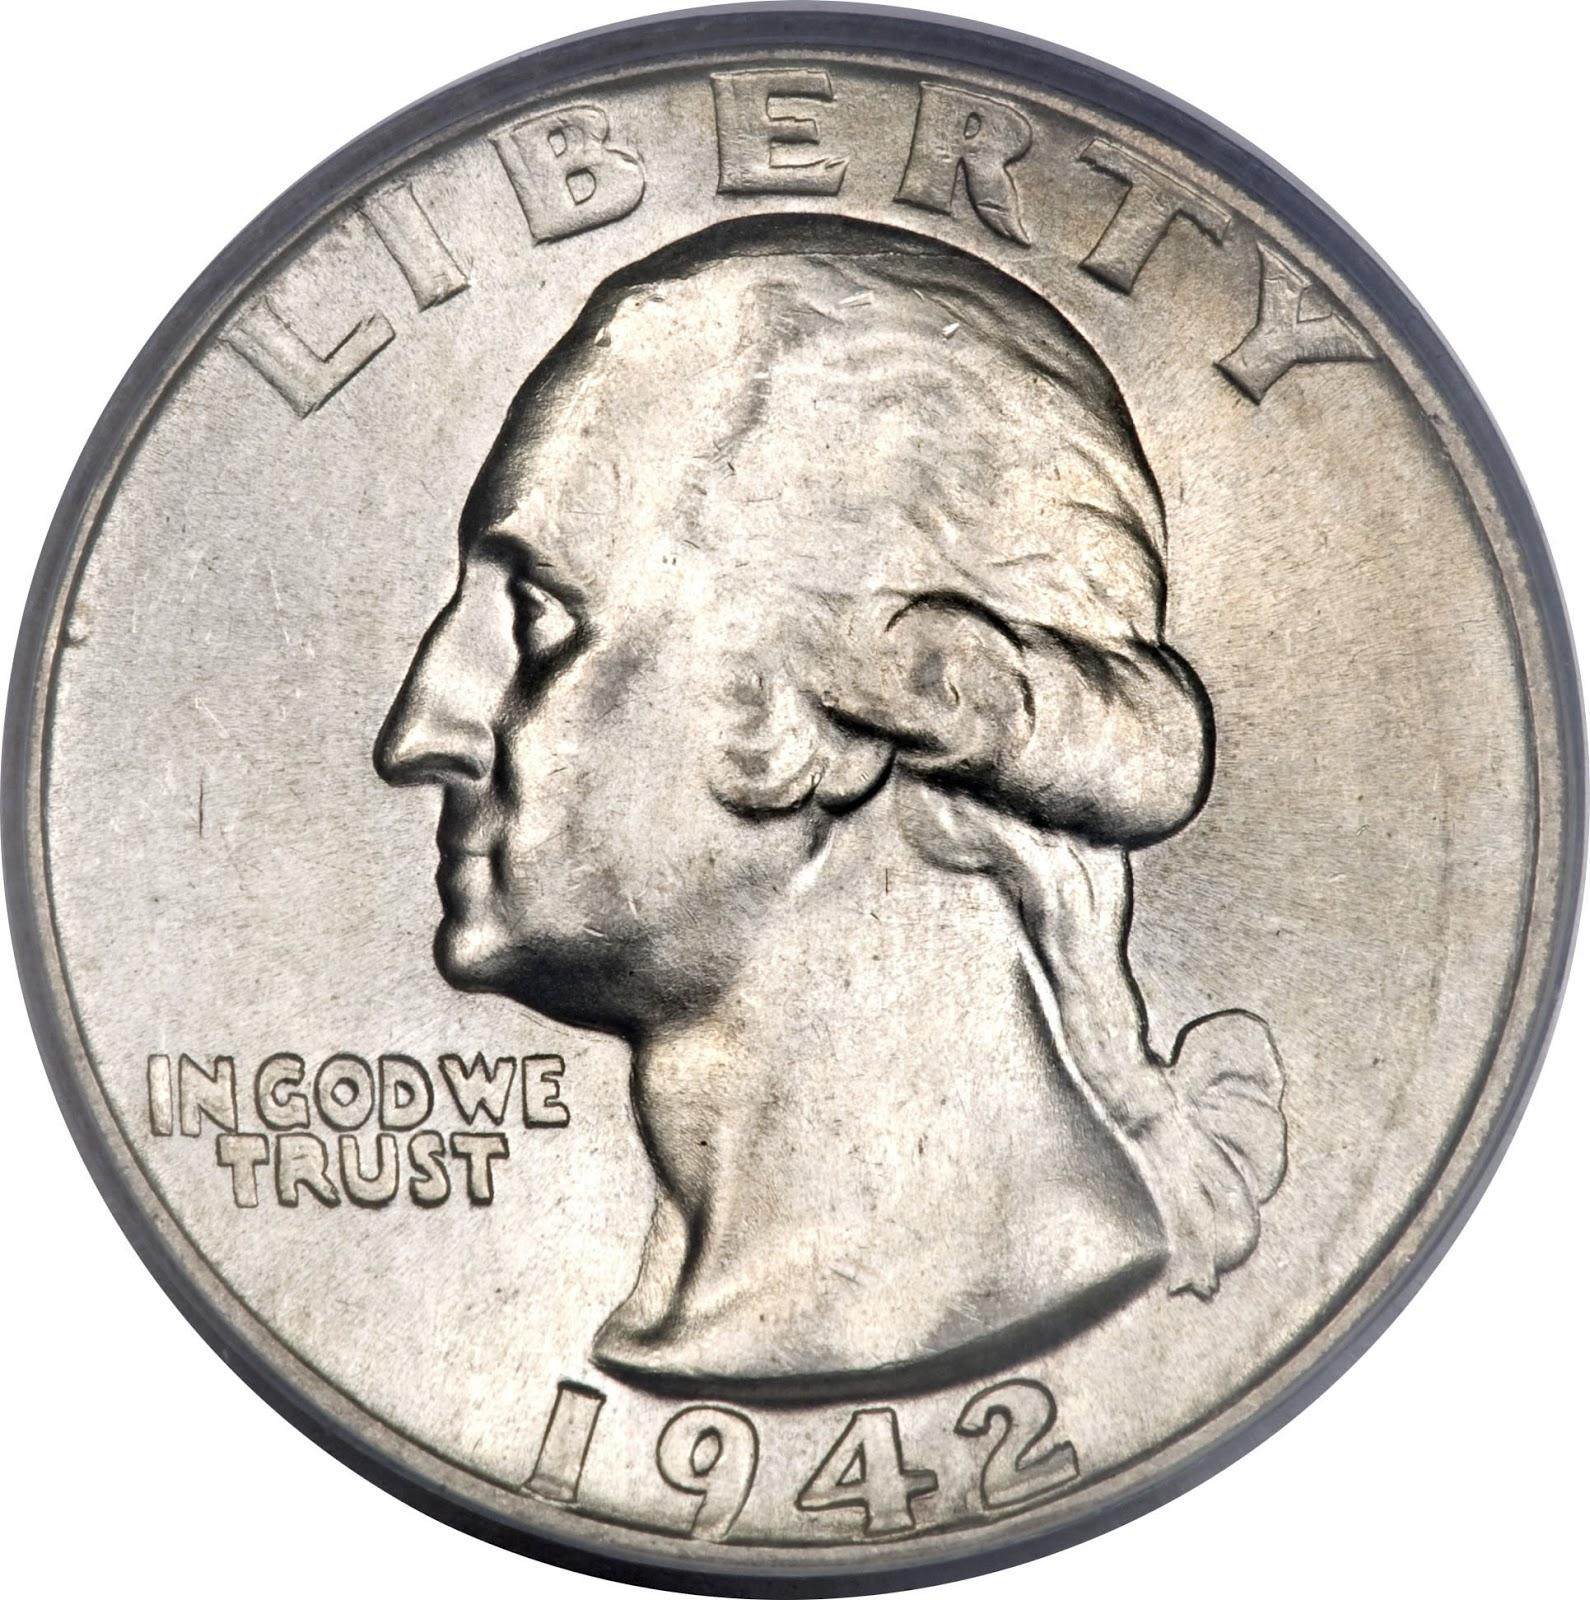 1967 quarter value 25 cents